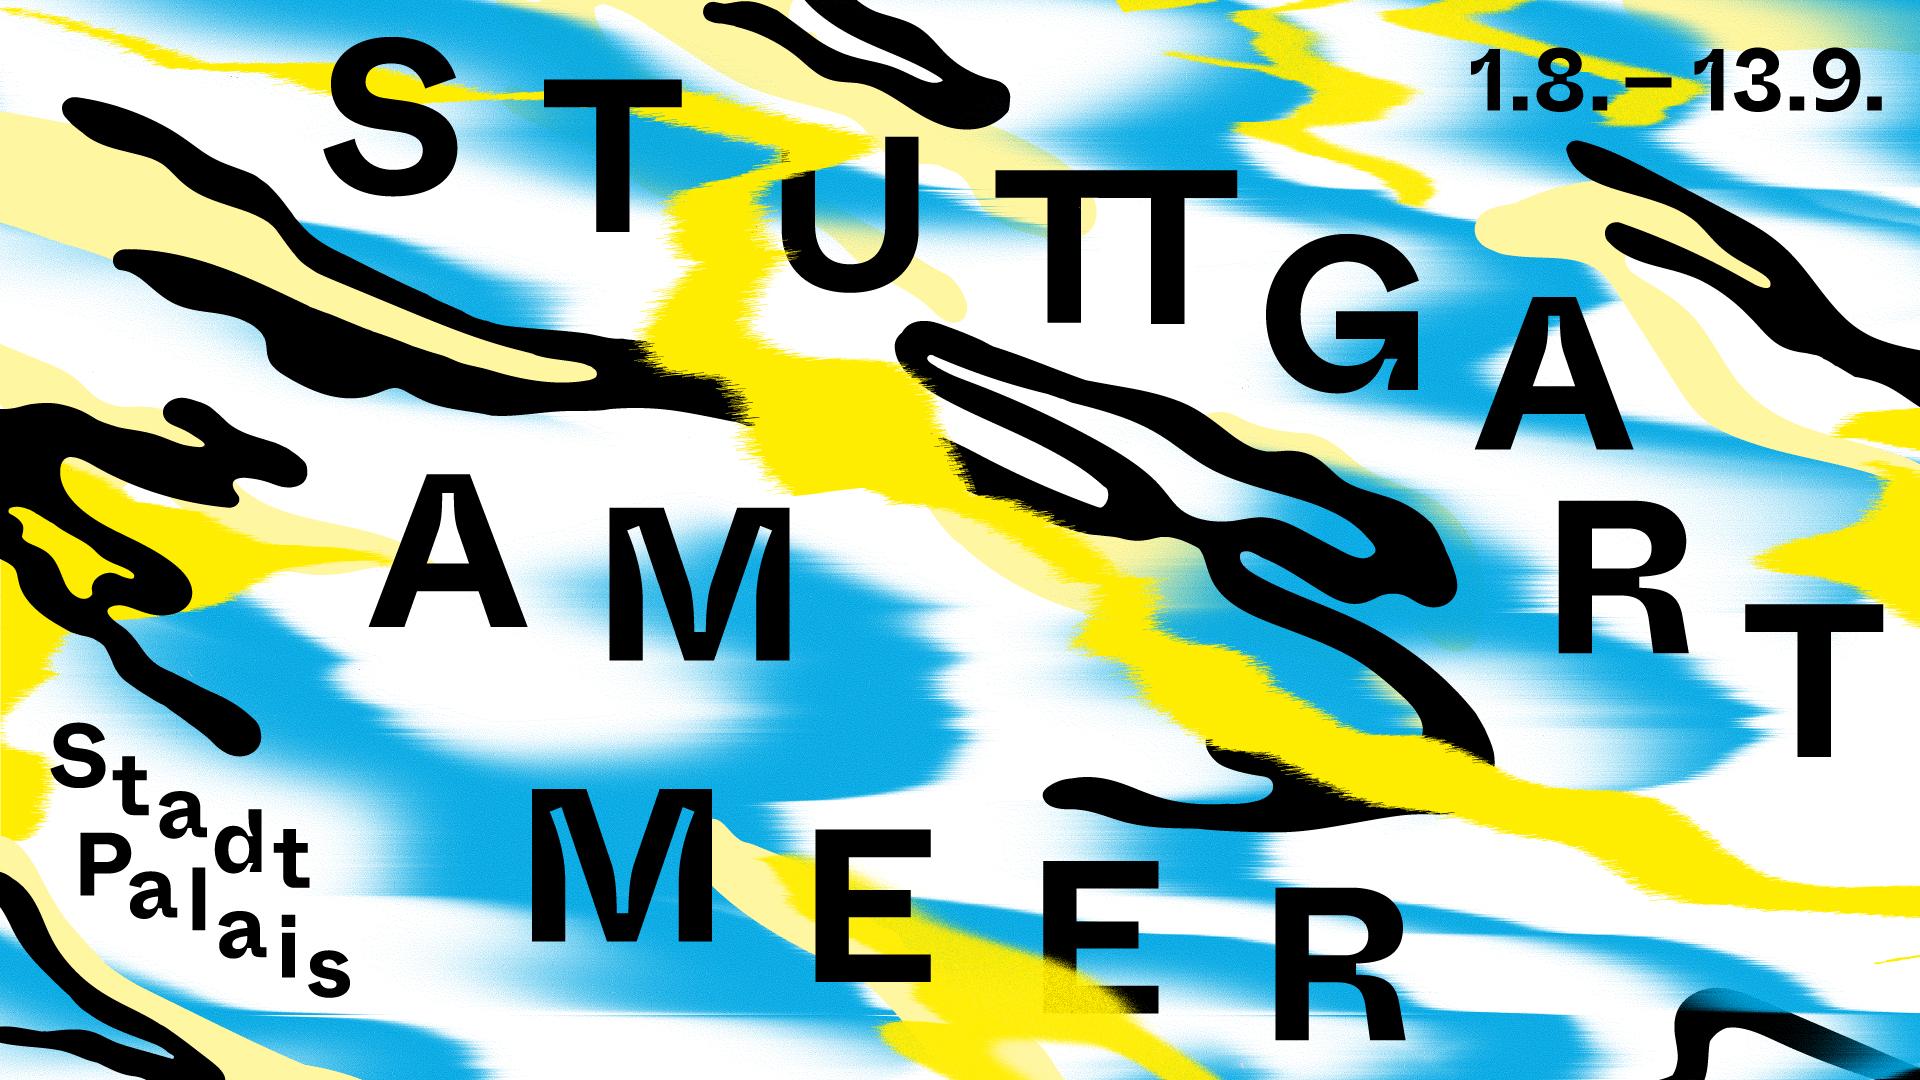 Stuttgart am Meer 2020 –Kopf über Wasser